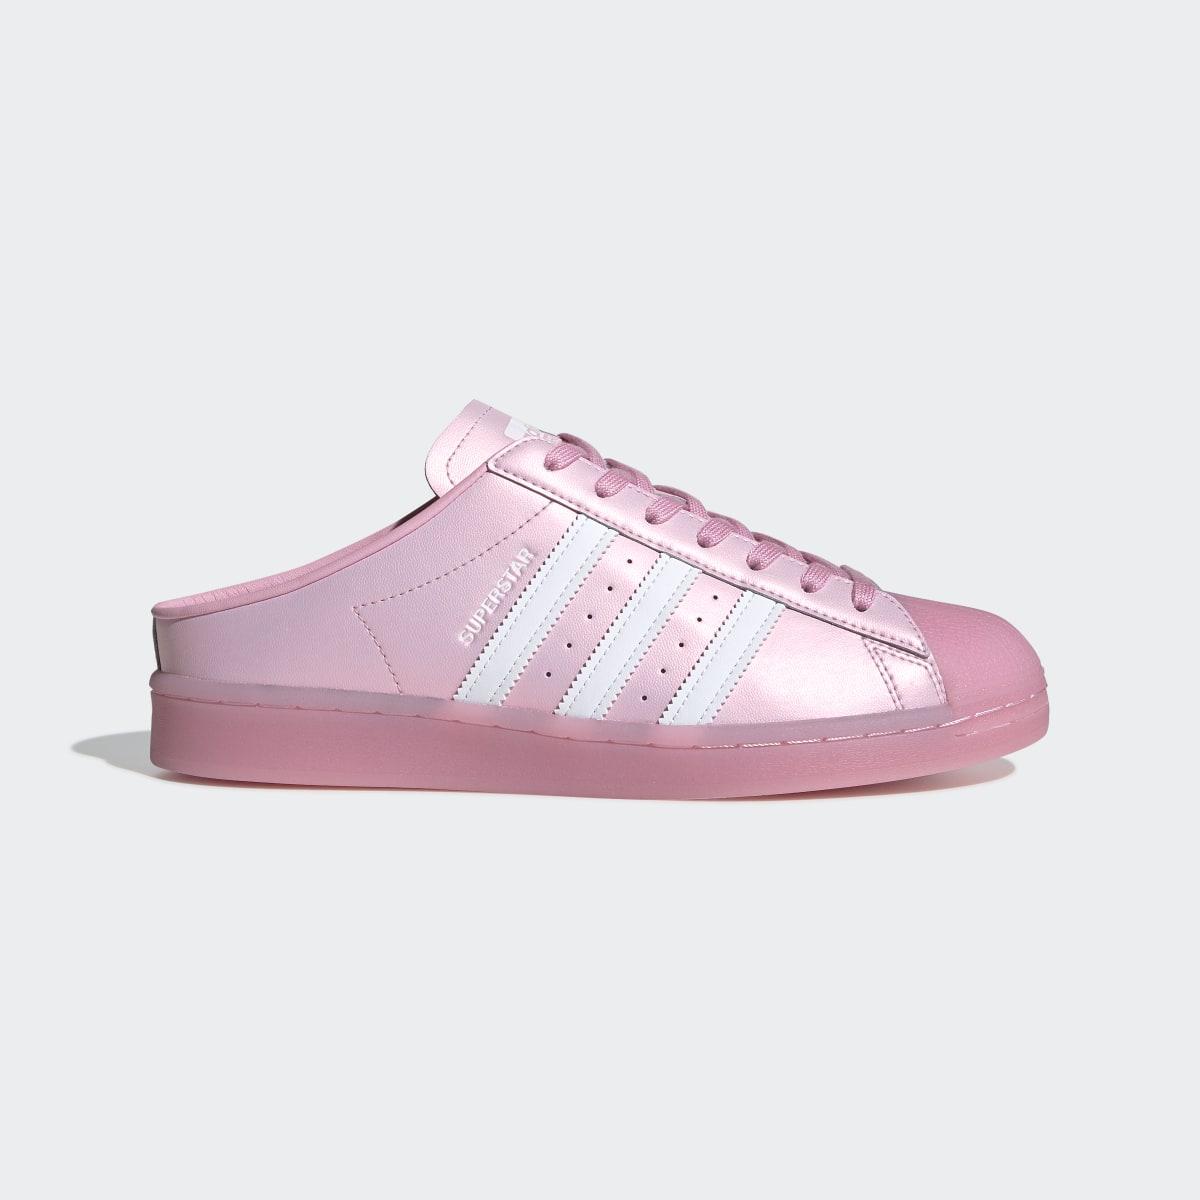 Superstar Mule Shoes